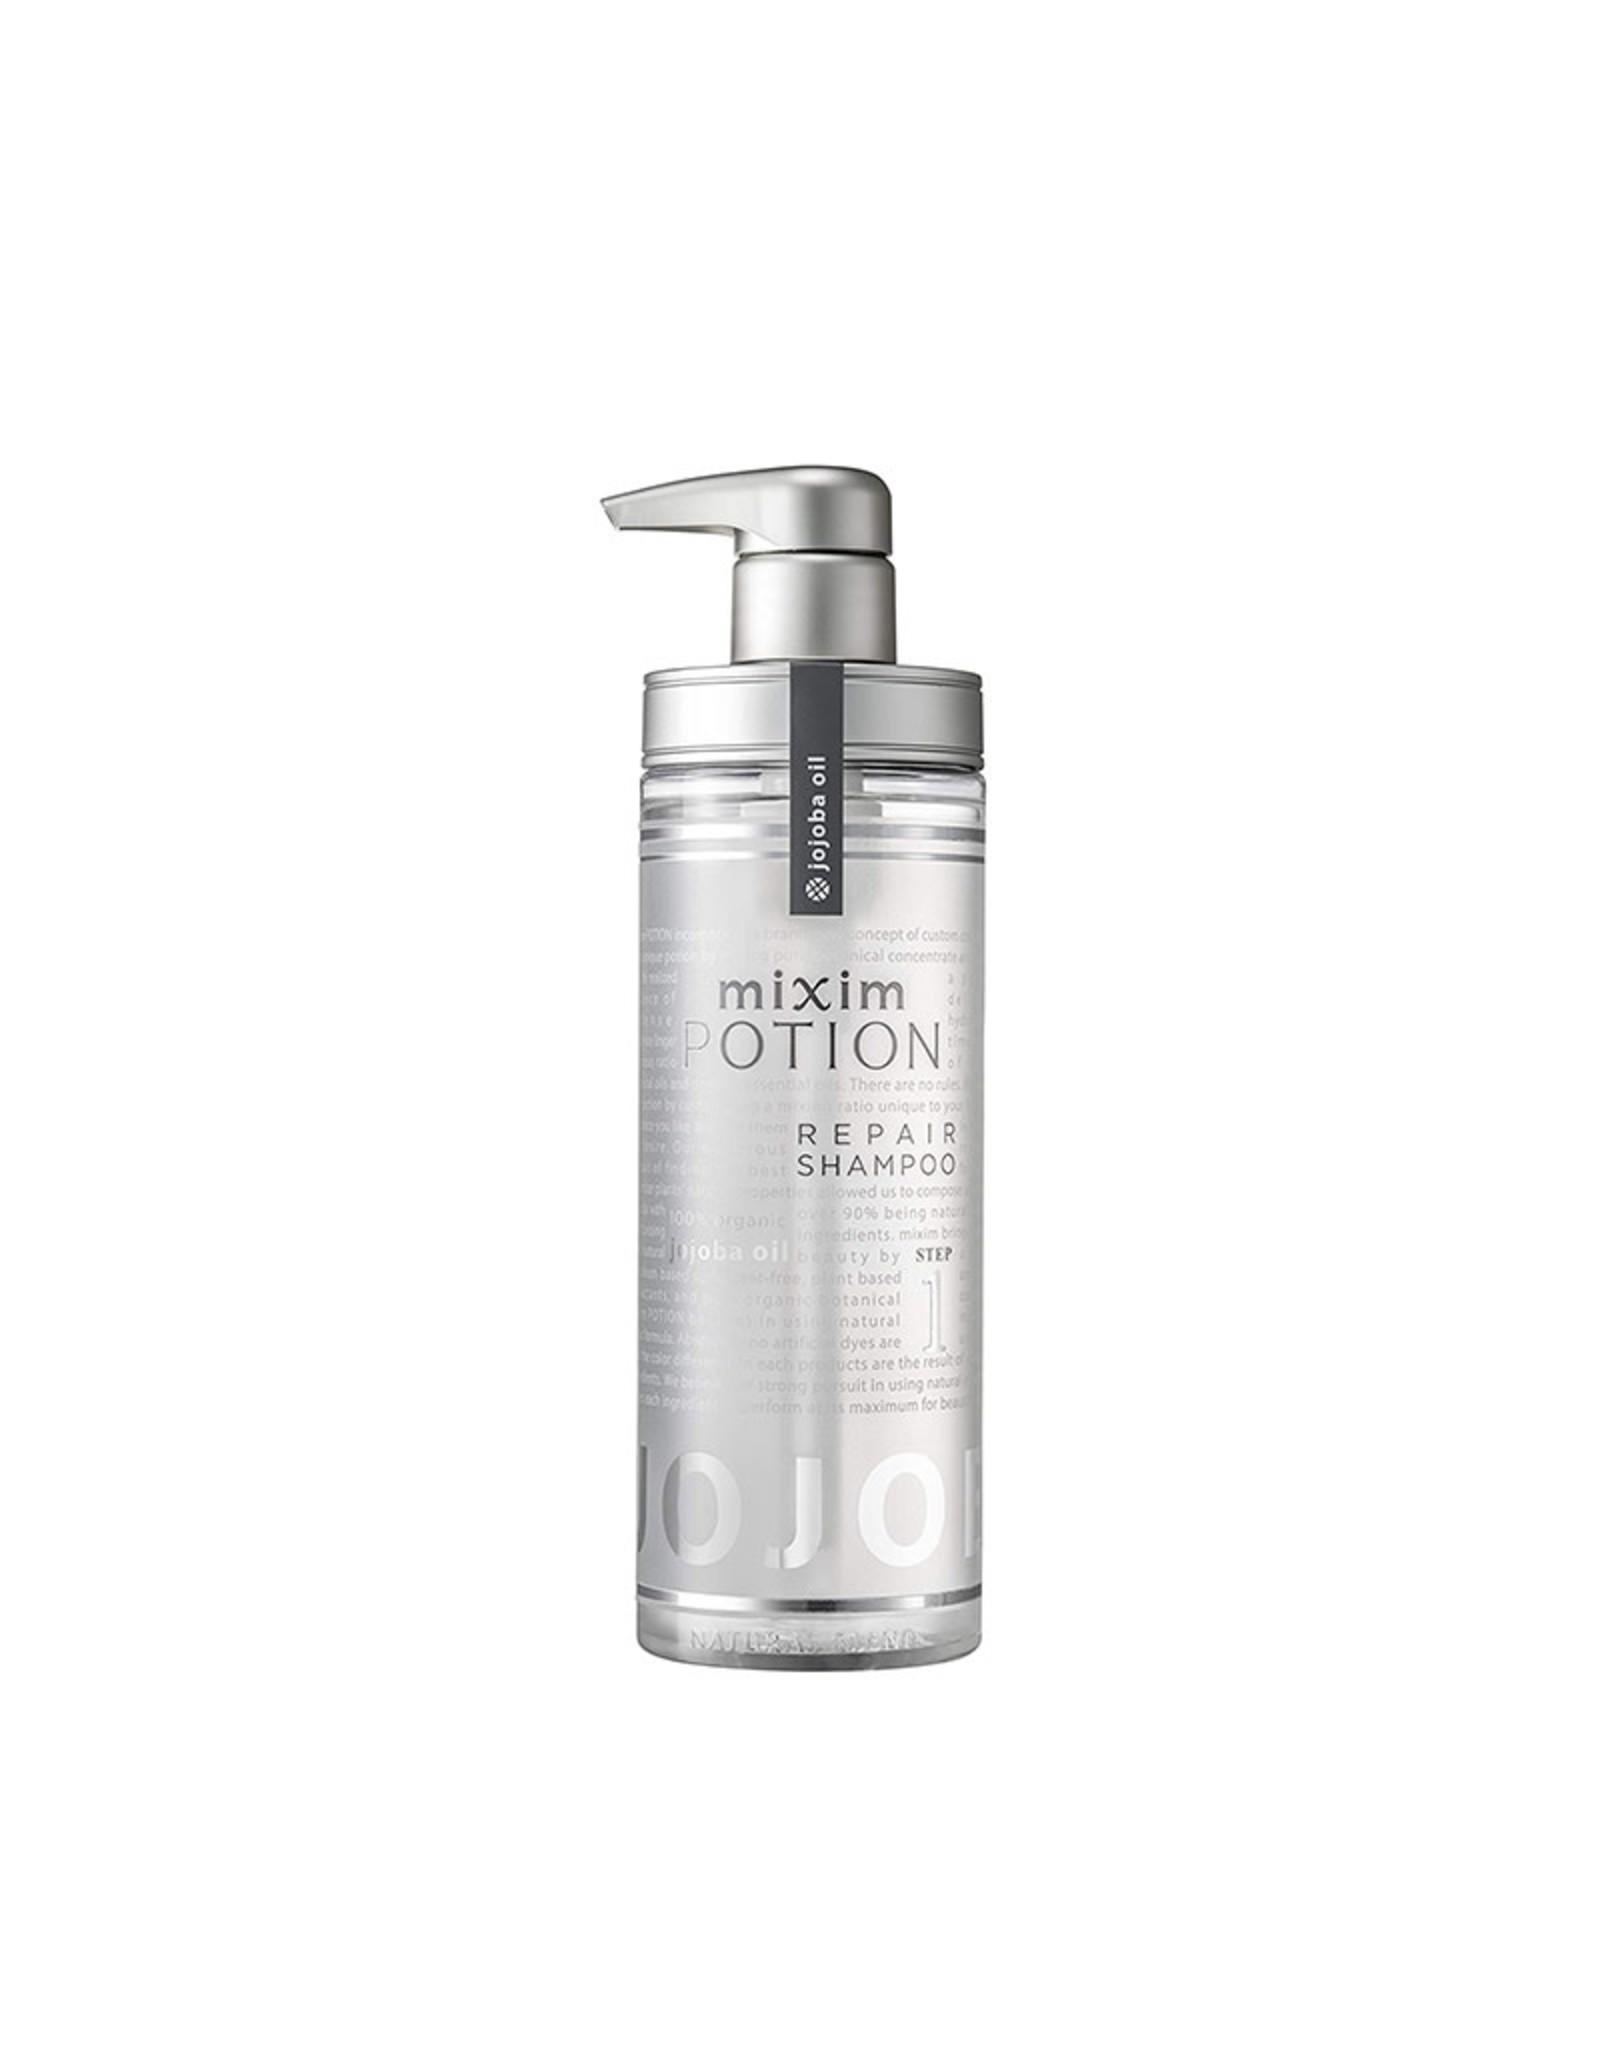 Vicrea Mixim Potion Repair Shampoo Step 1 440ml